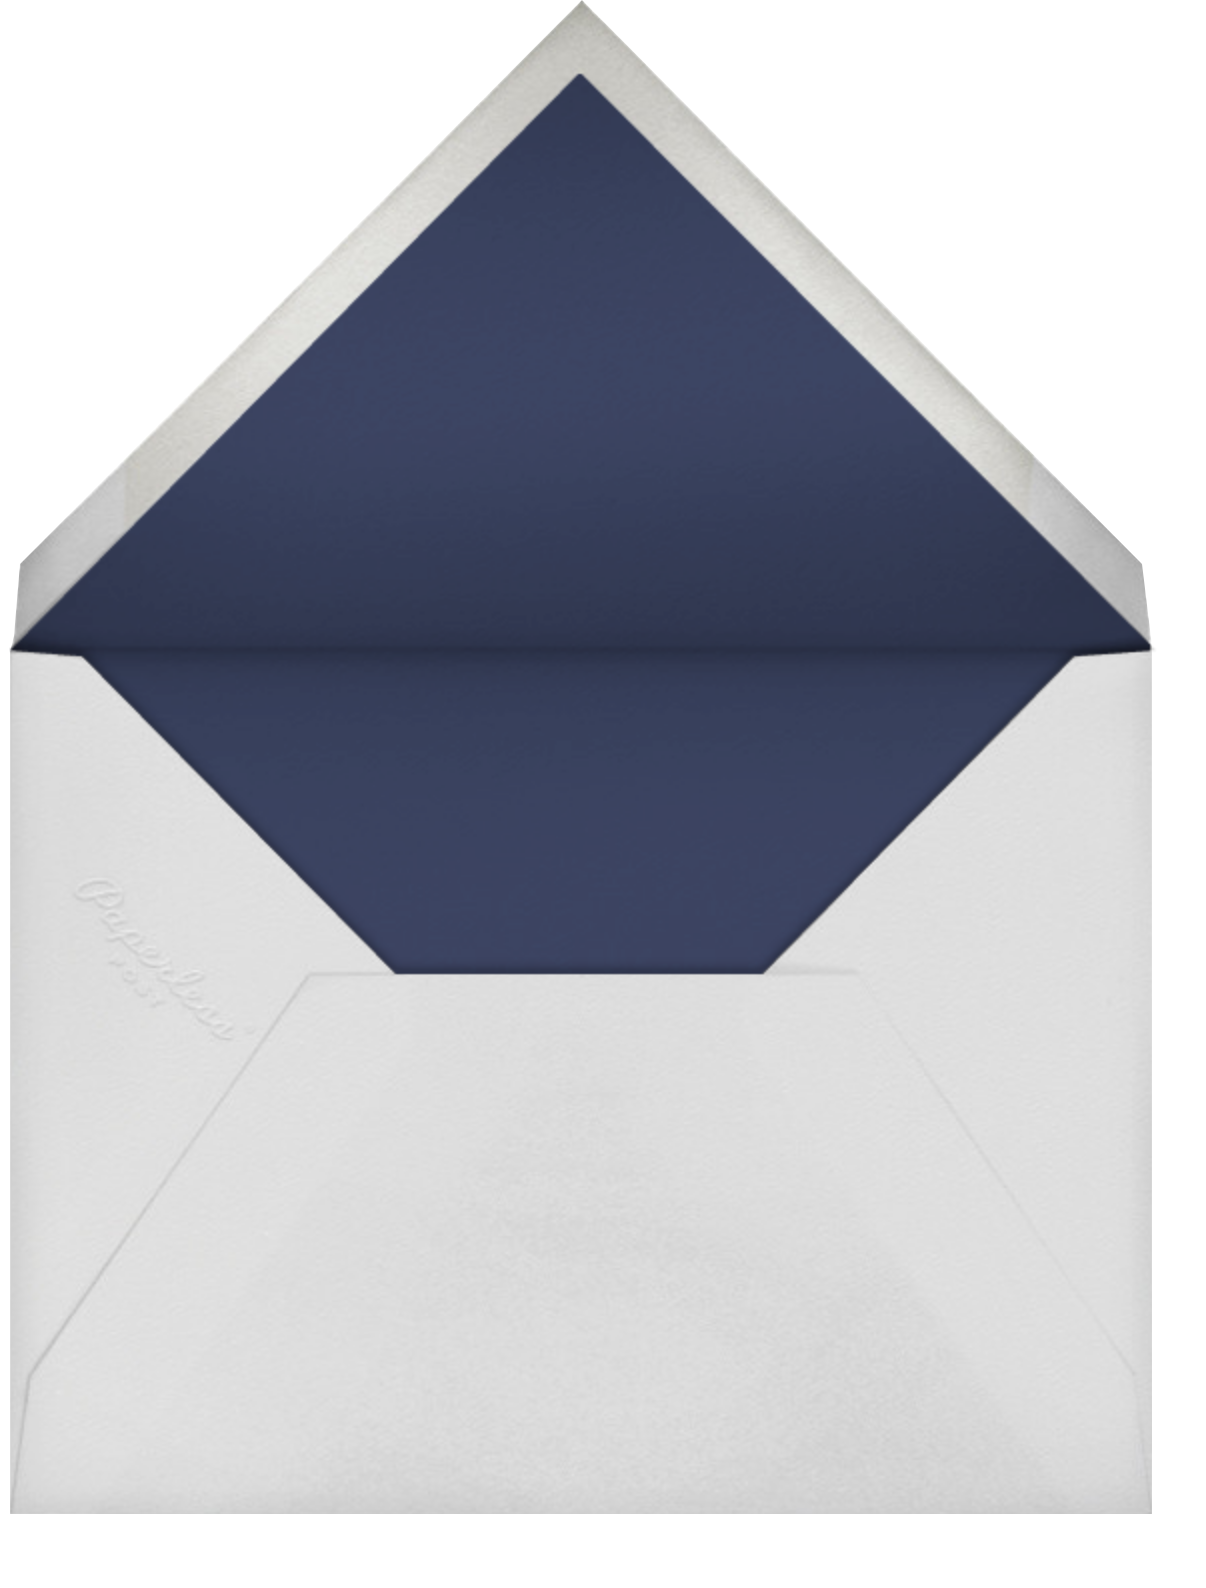 Stempel (Stationery) - Navy - Vera Wang - Wedding - envelope back